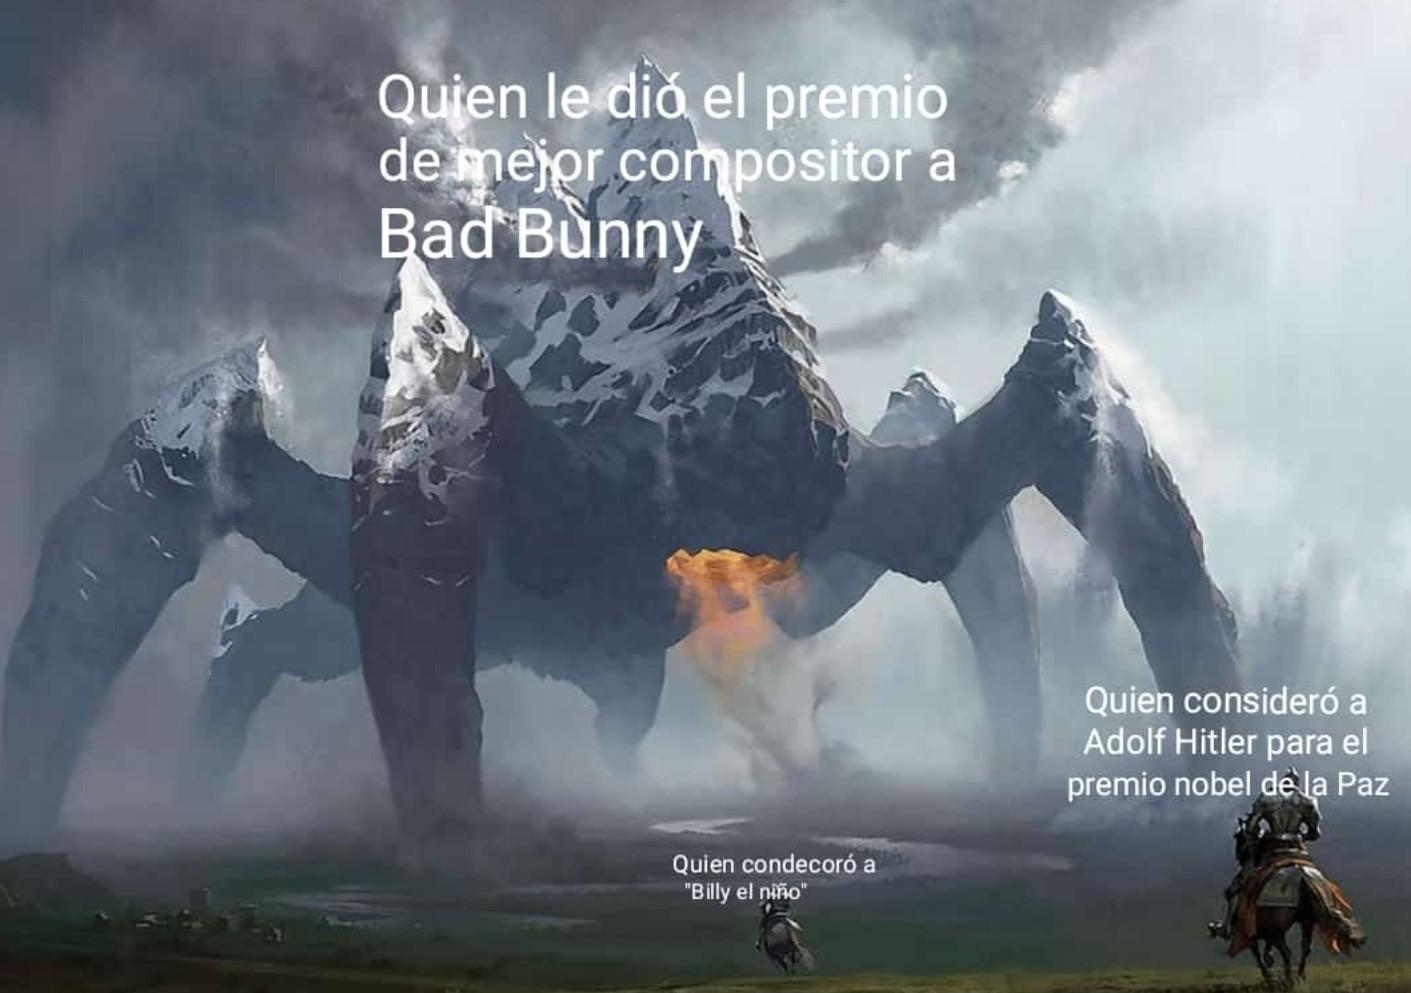 Injusticia señores - meme